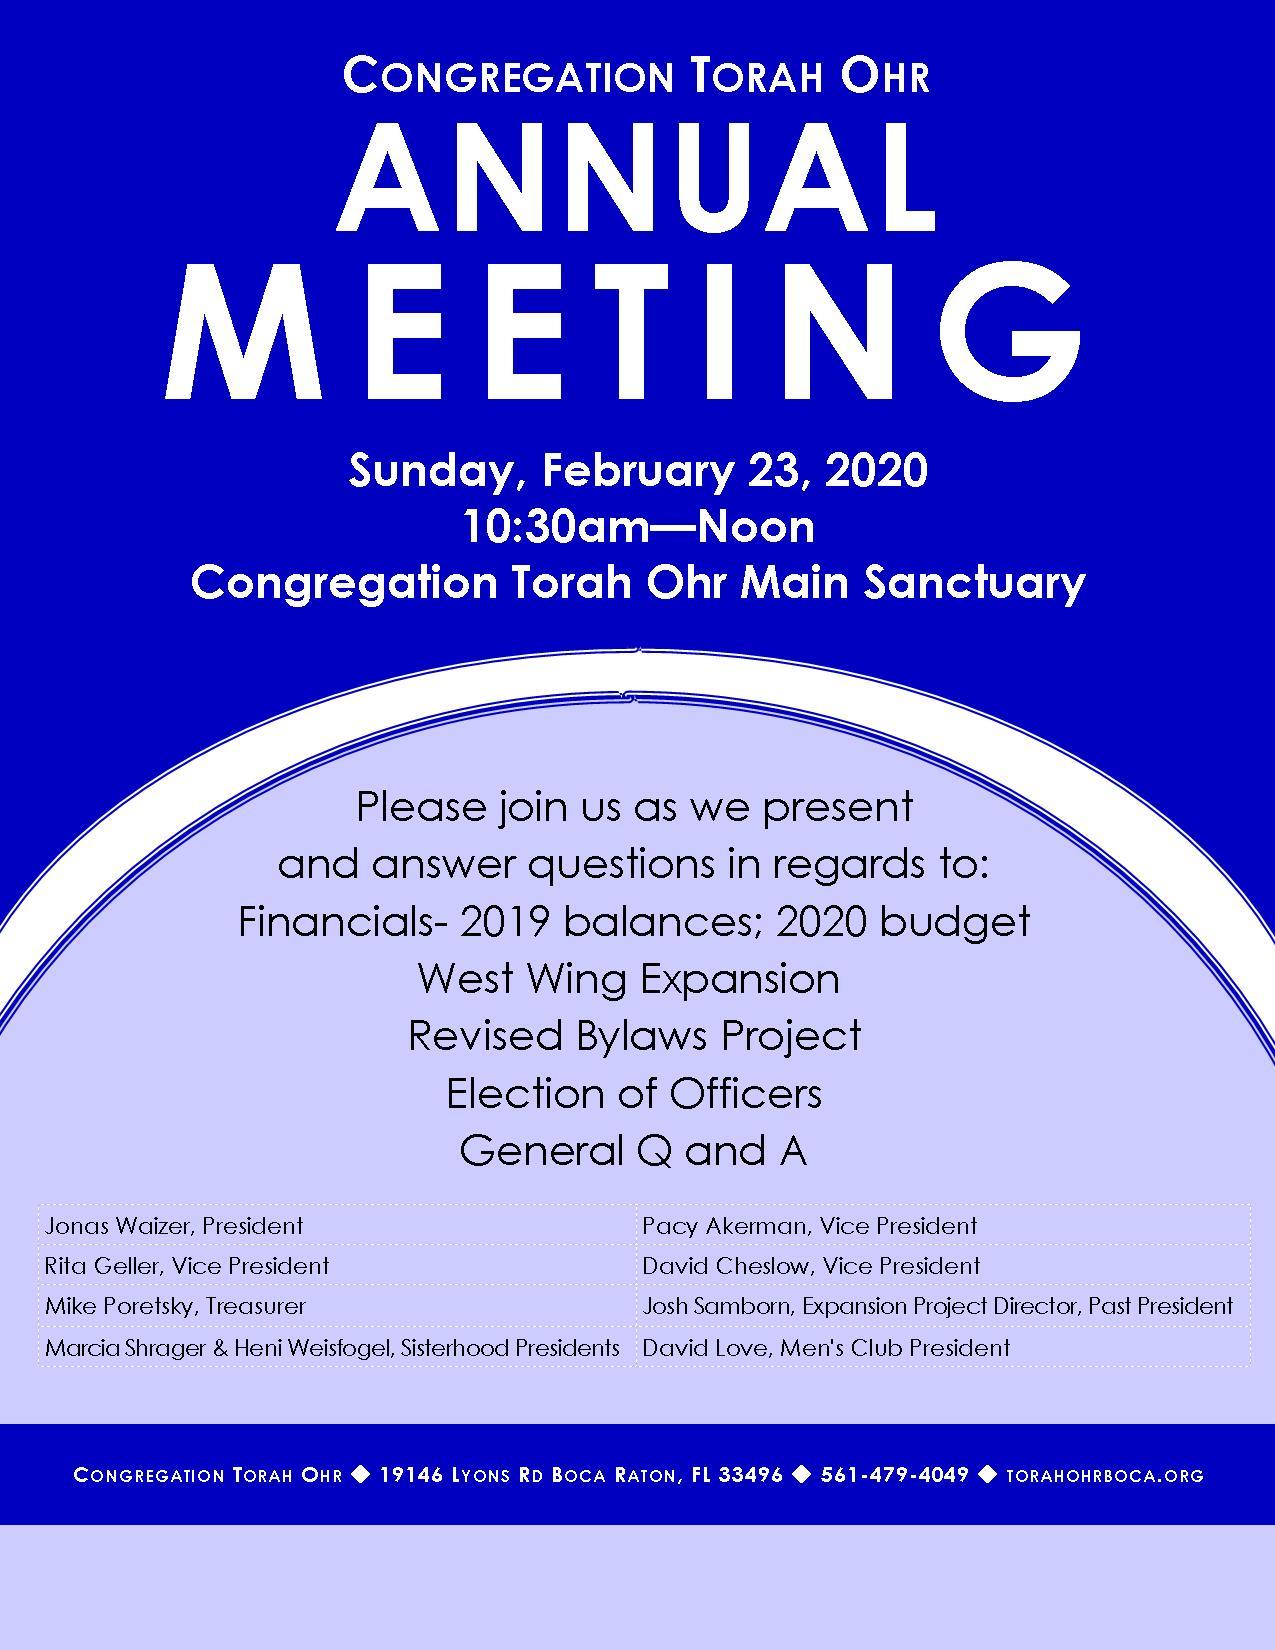 "<a href=""https://images.shulcloud.com/590/uploads/5780/AnnualMeeting.pdf""                                     target=""_blank"">                                                                 <span class=""slider_title"">                                     Congregation Torah Ohr Annual Meeting - 10:30am 2/23/2020                                </span>                                                                 </a>"